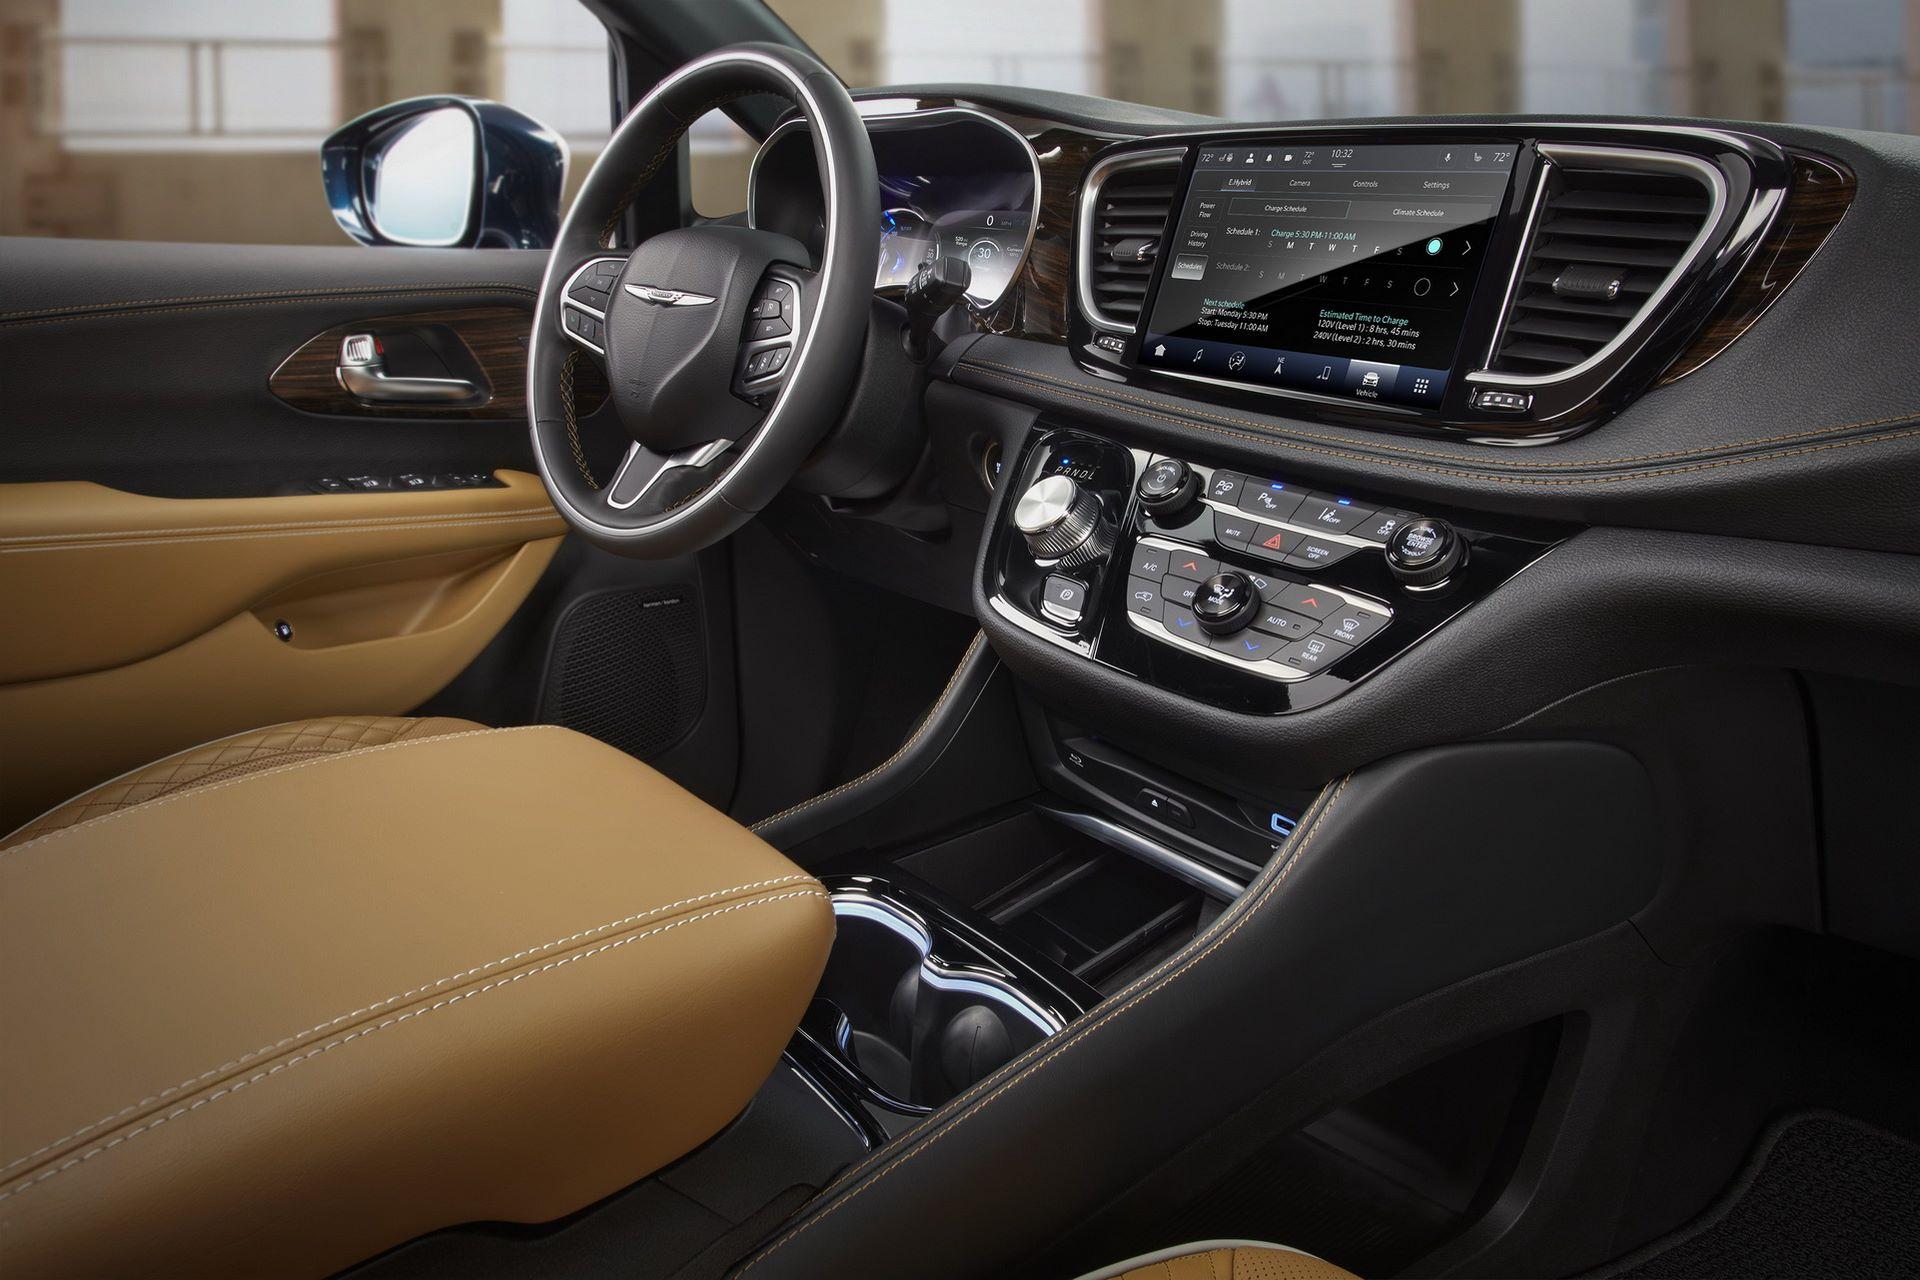 2021-Chrysler-Pacifica-81